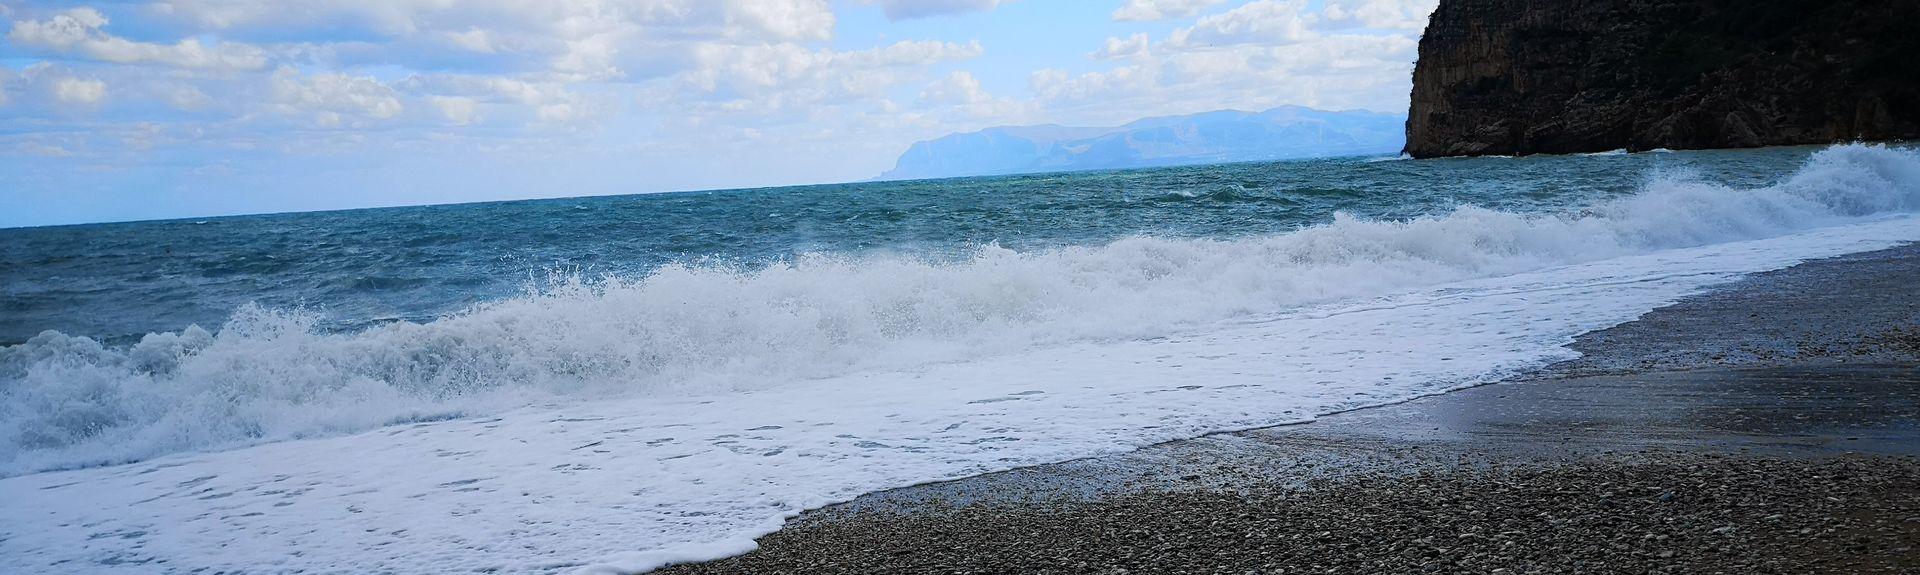 Partinico, Sizilien, Italien